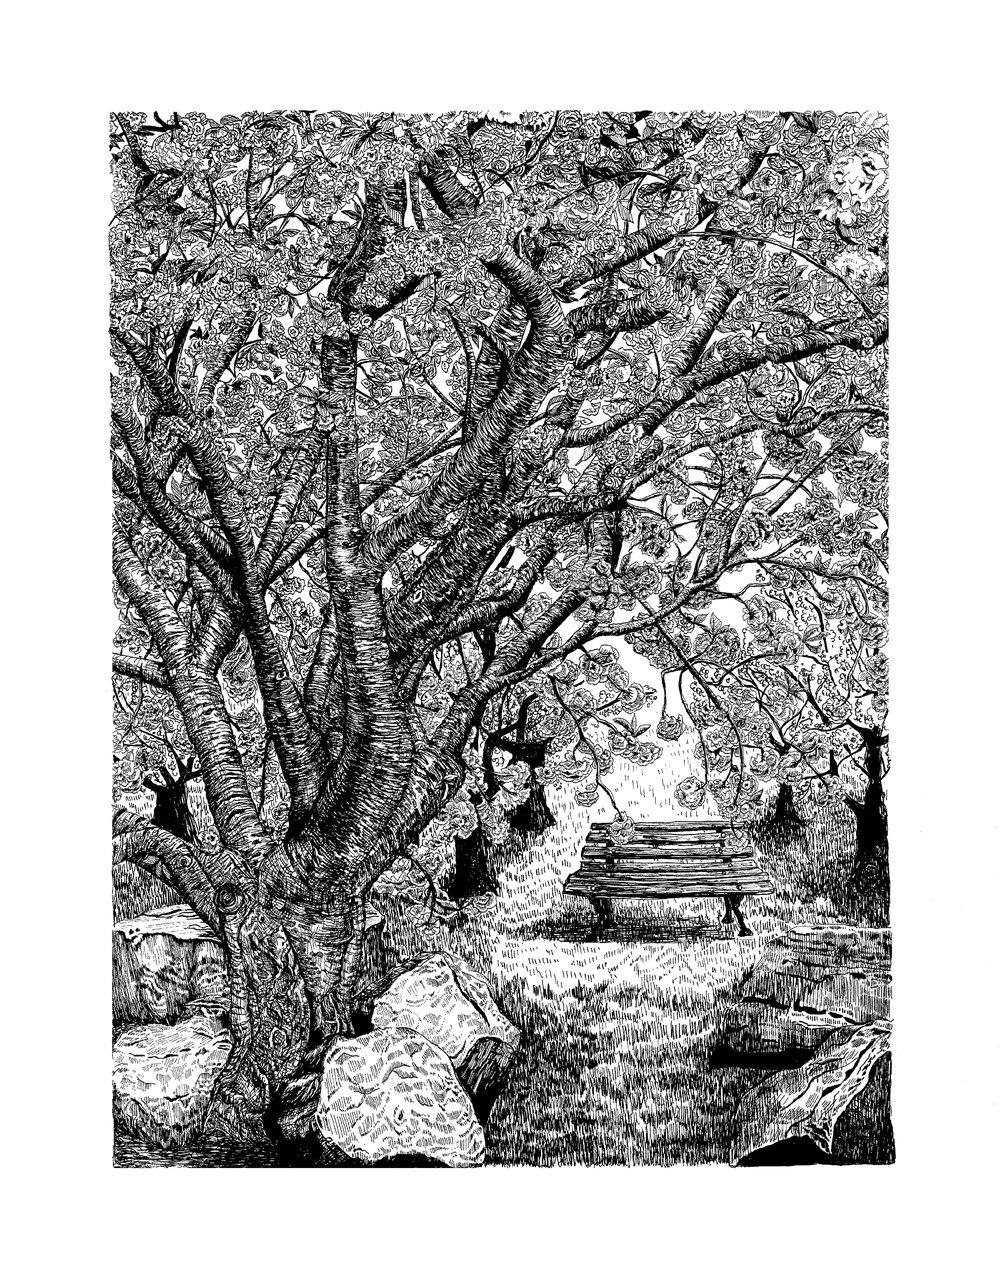 Cherry Blossom Tree + Bench small.jpg